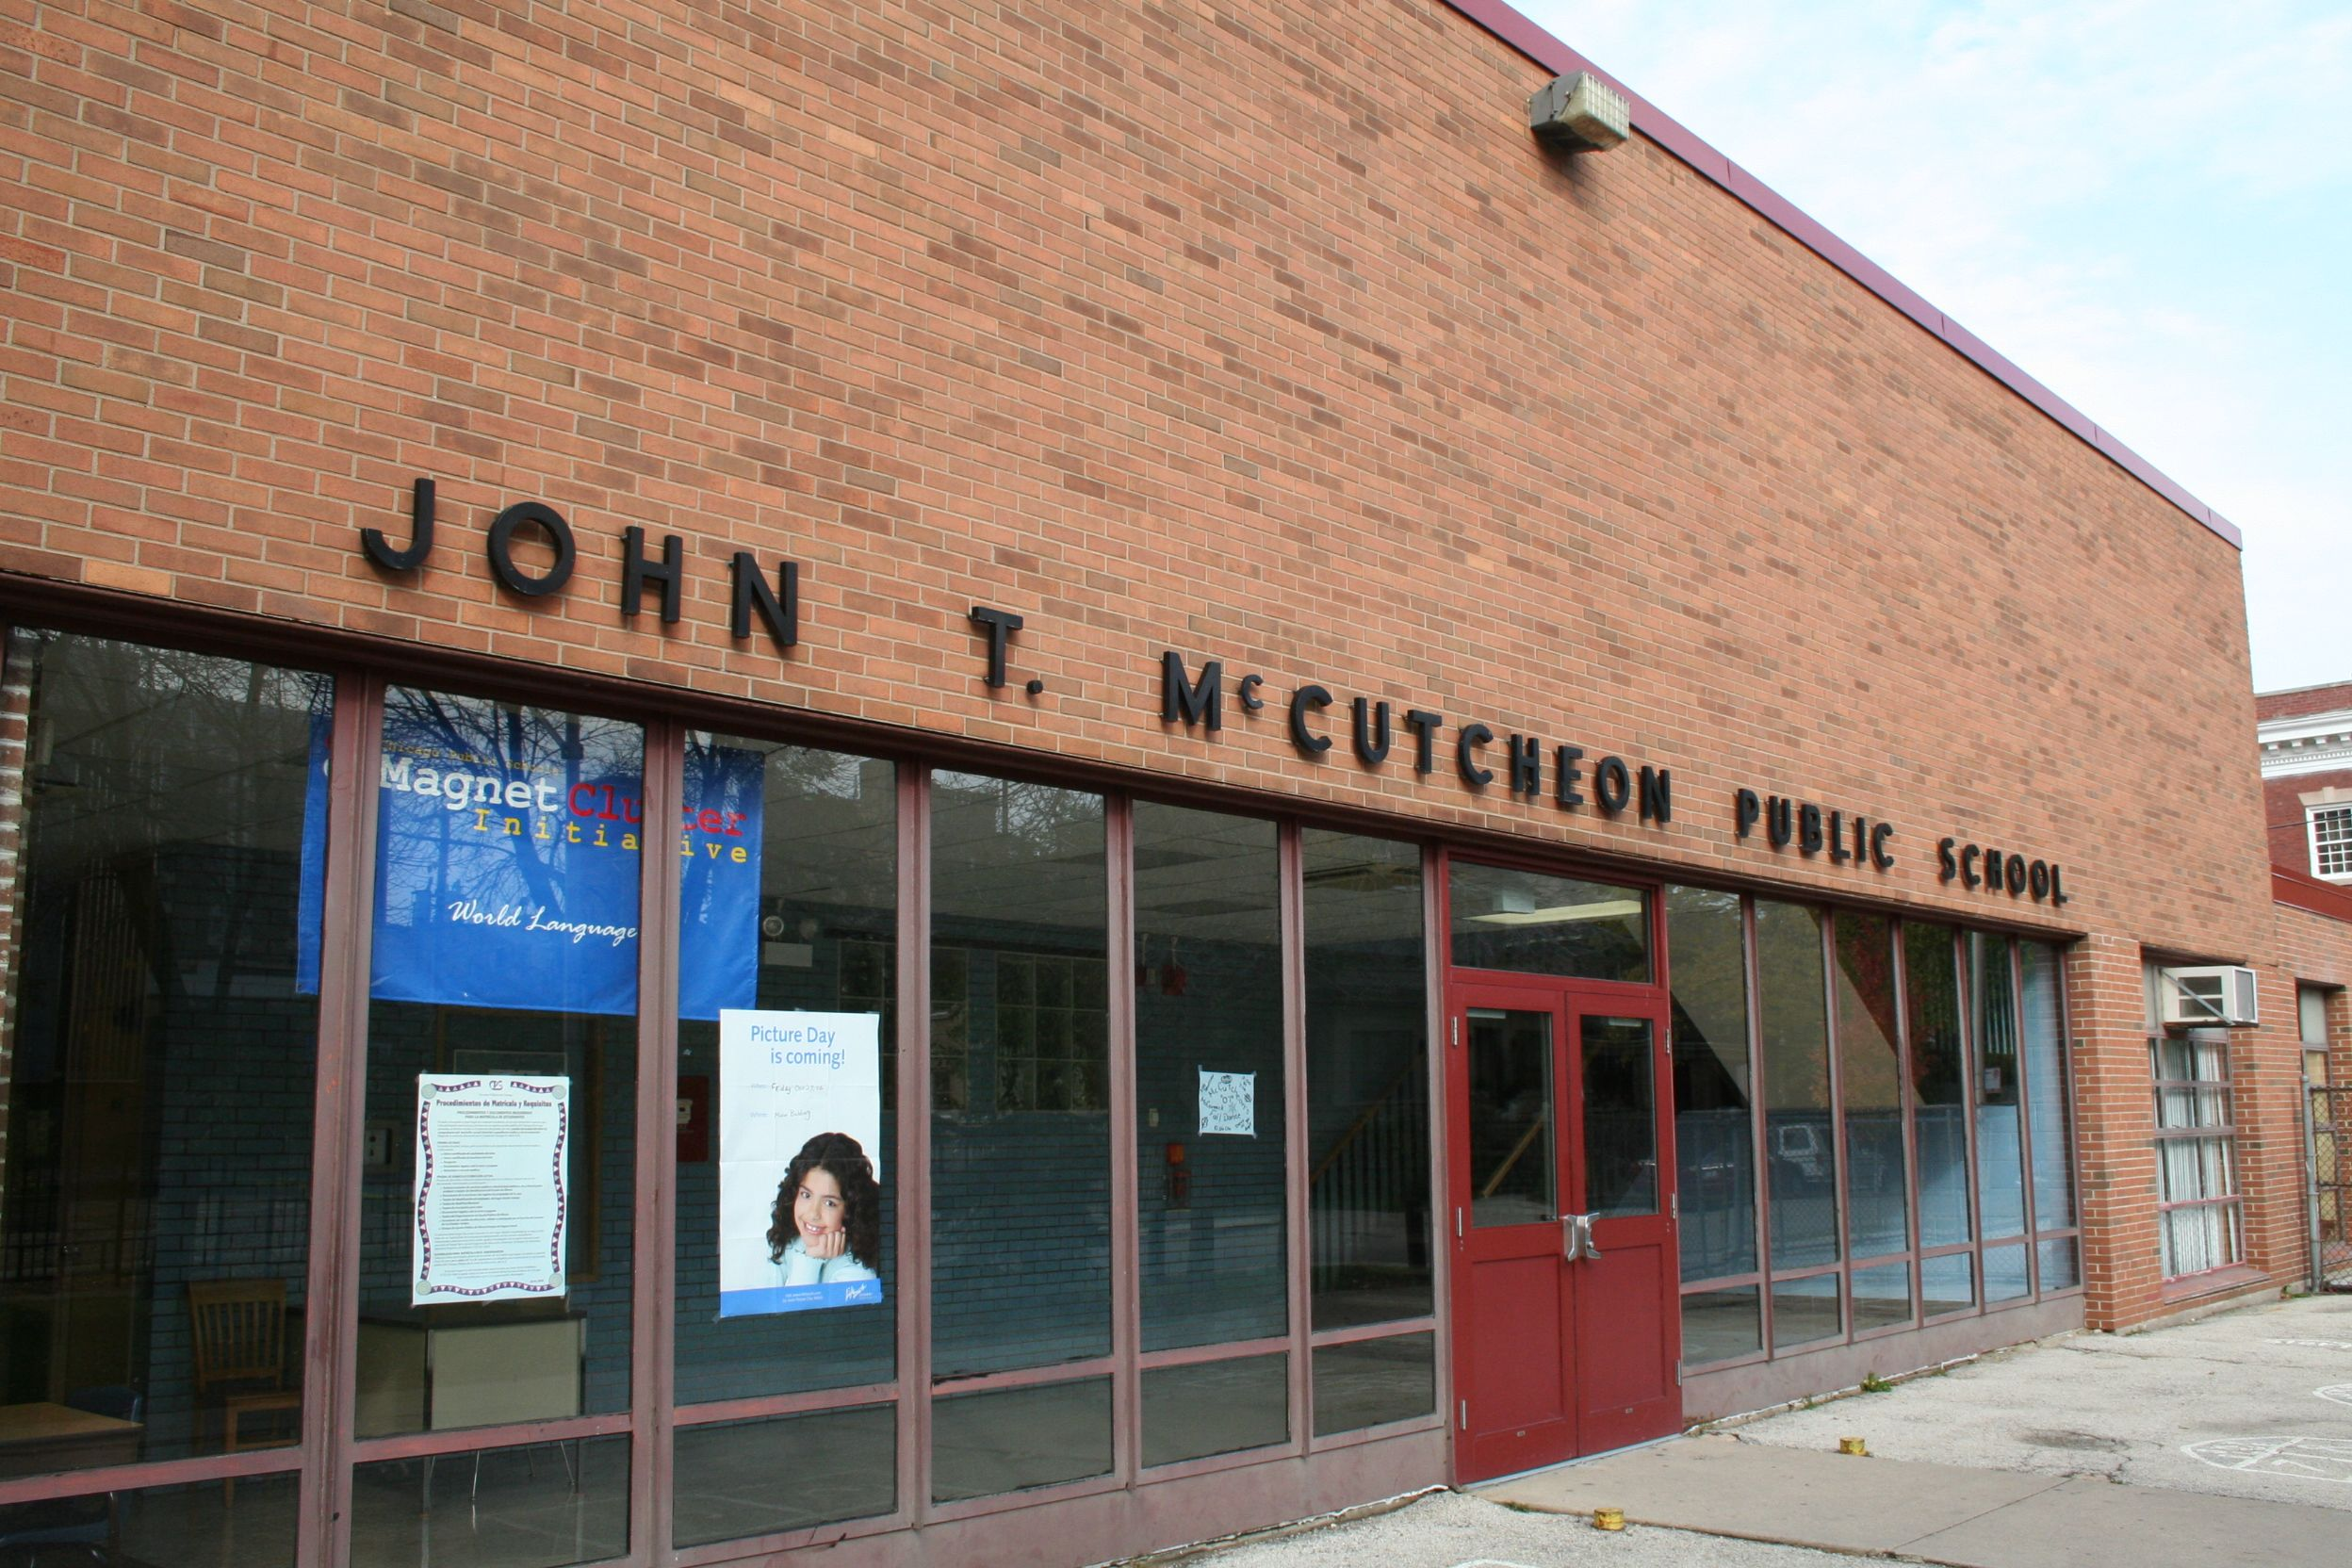 featured image John T McCutcheon Elementary School & Branch